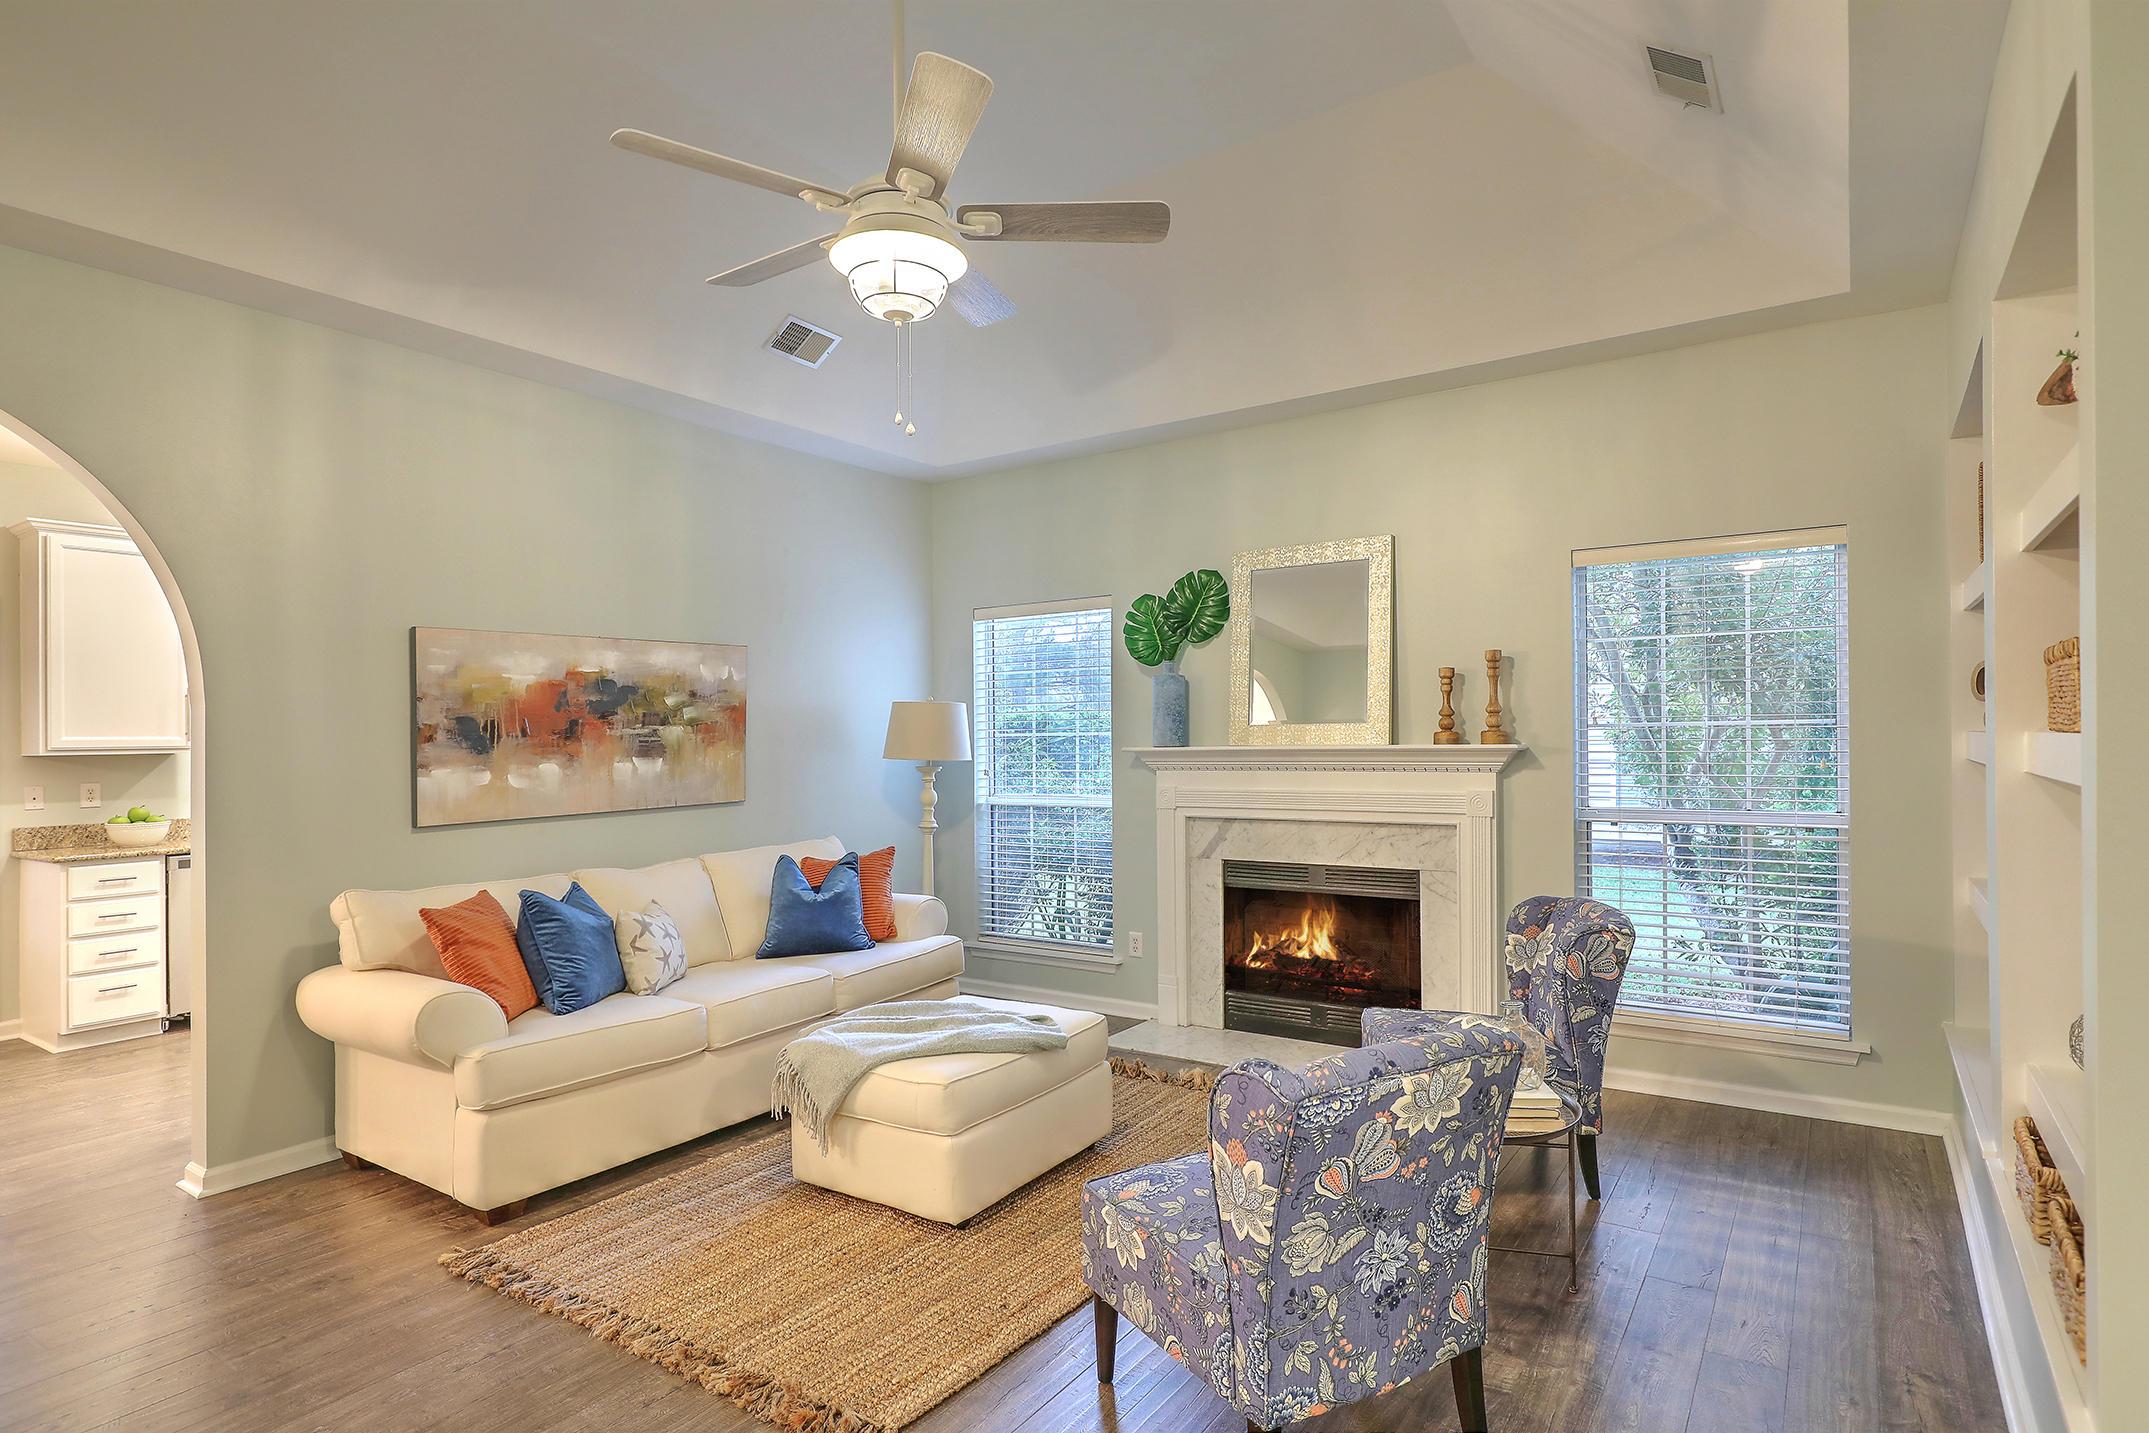 Dunes West Homes For Sale - 1309 Sassafrass, Mount Pleasant, SC - 29